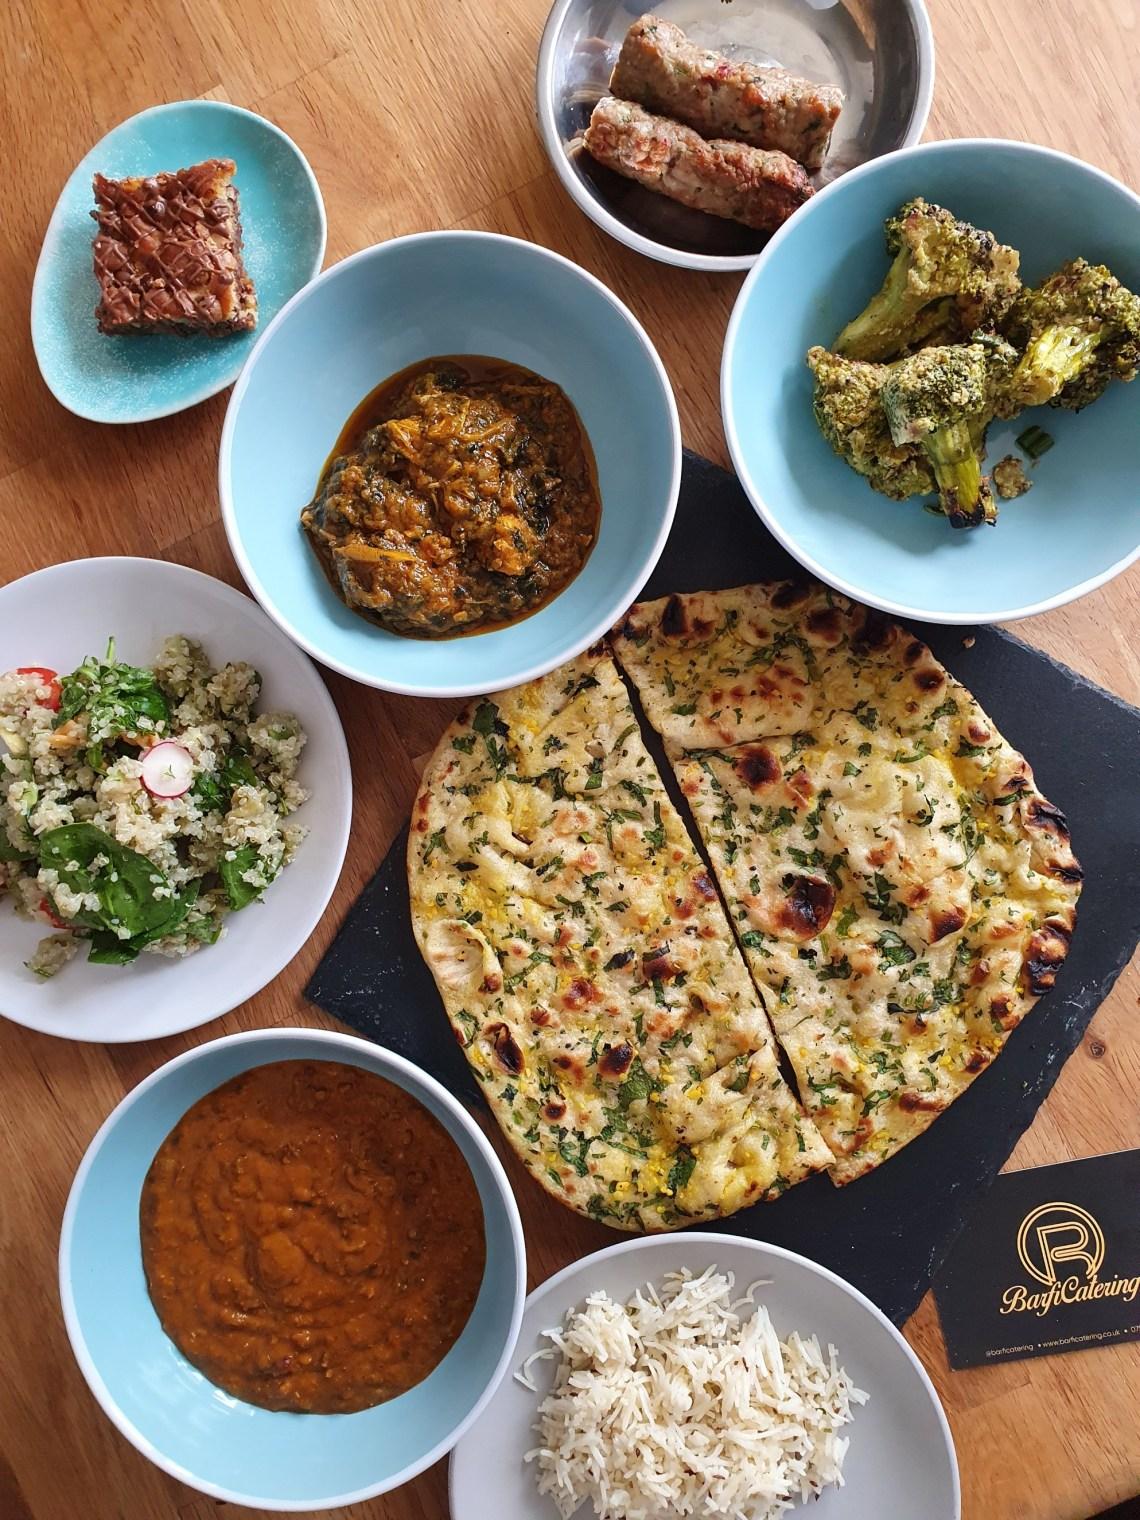 Barfi catering food box spread - Indian food